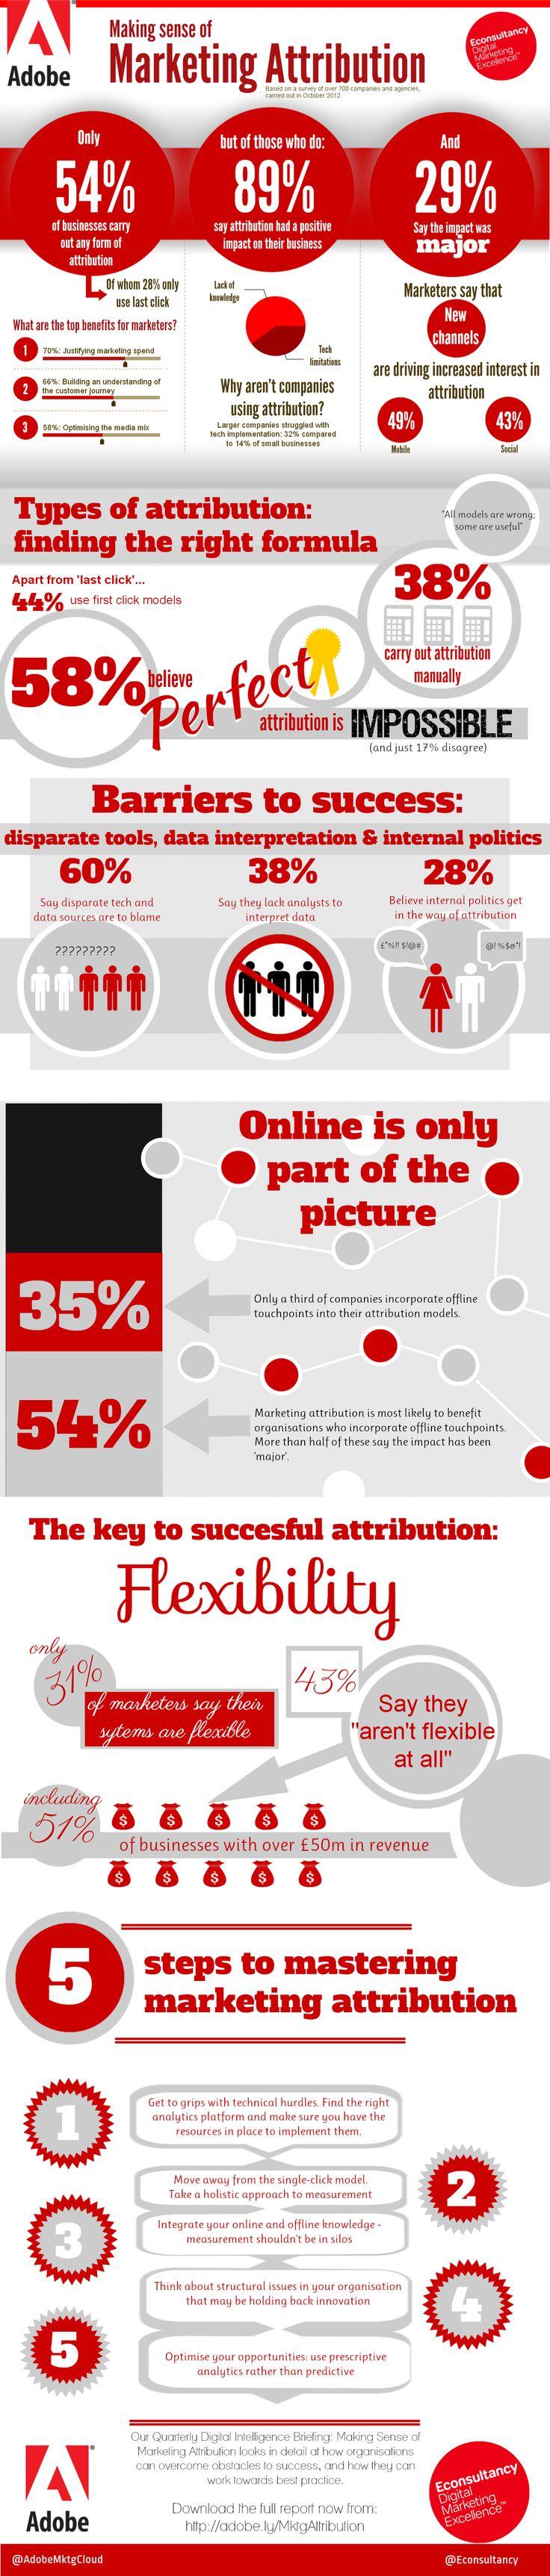 Interesting! What is Digital Marketing